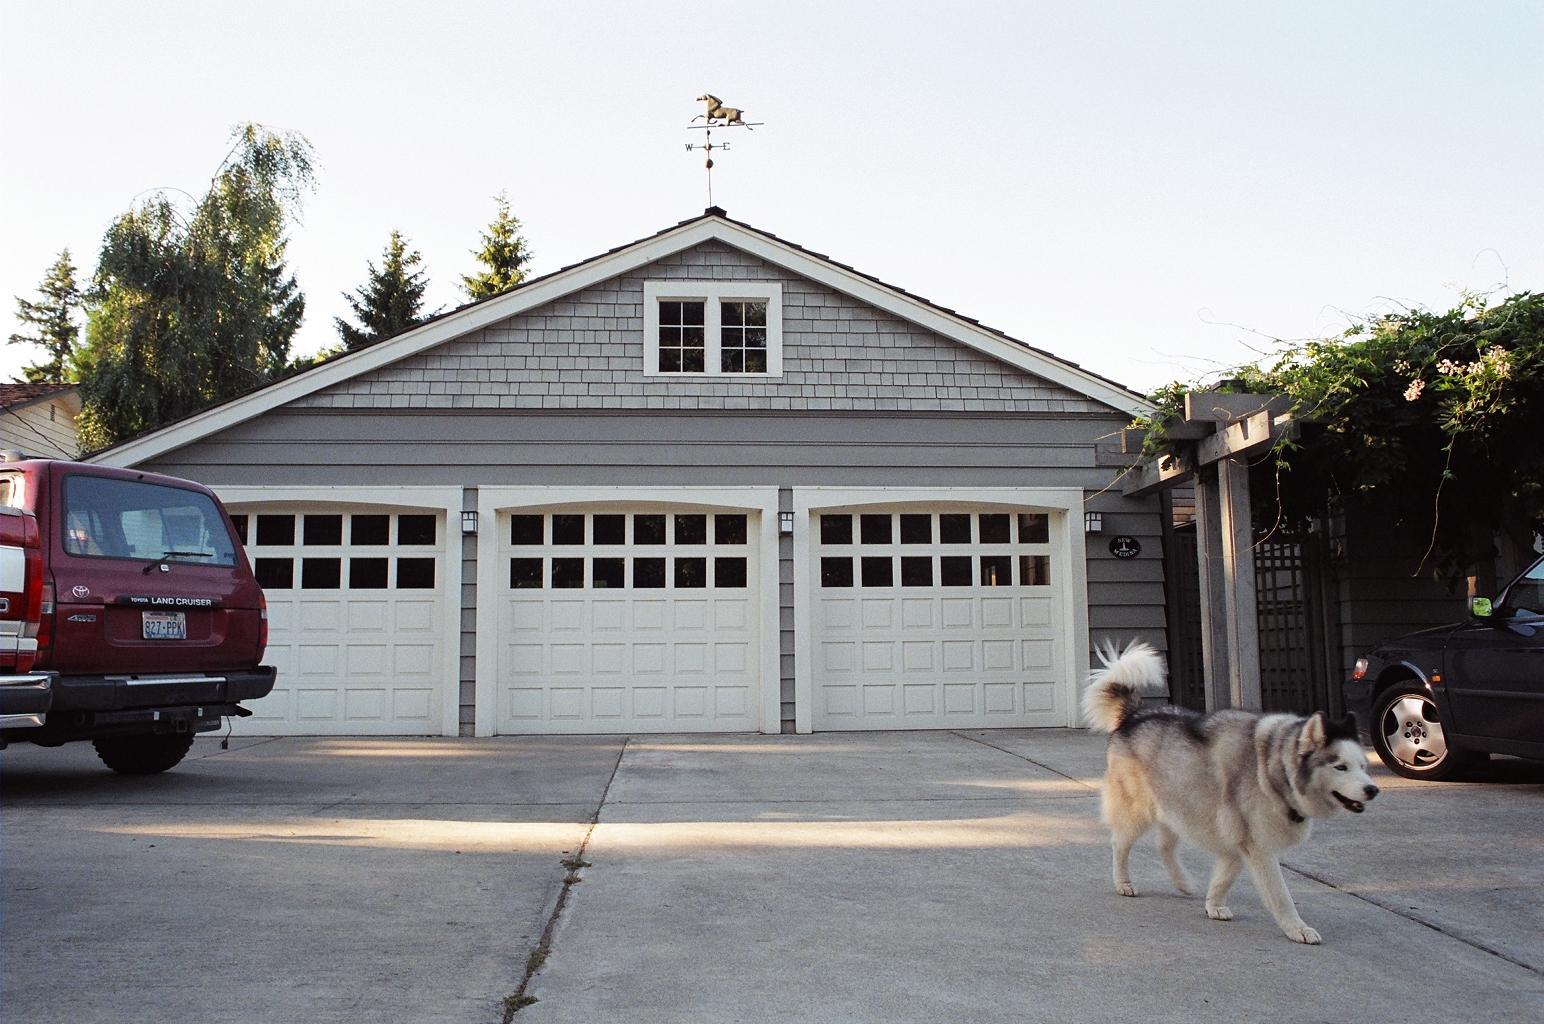 8Medina garage.jpg